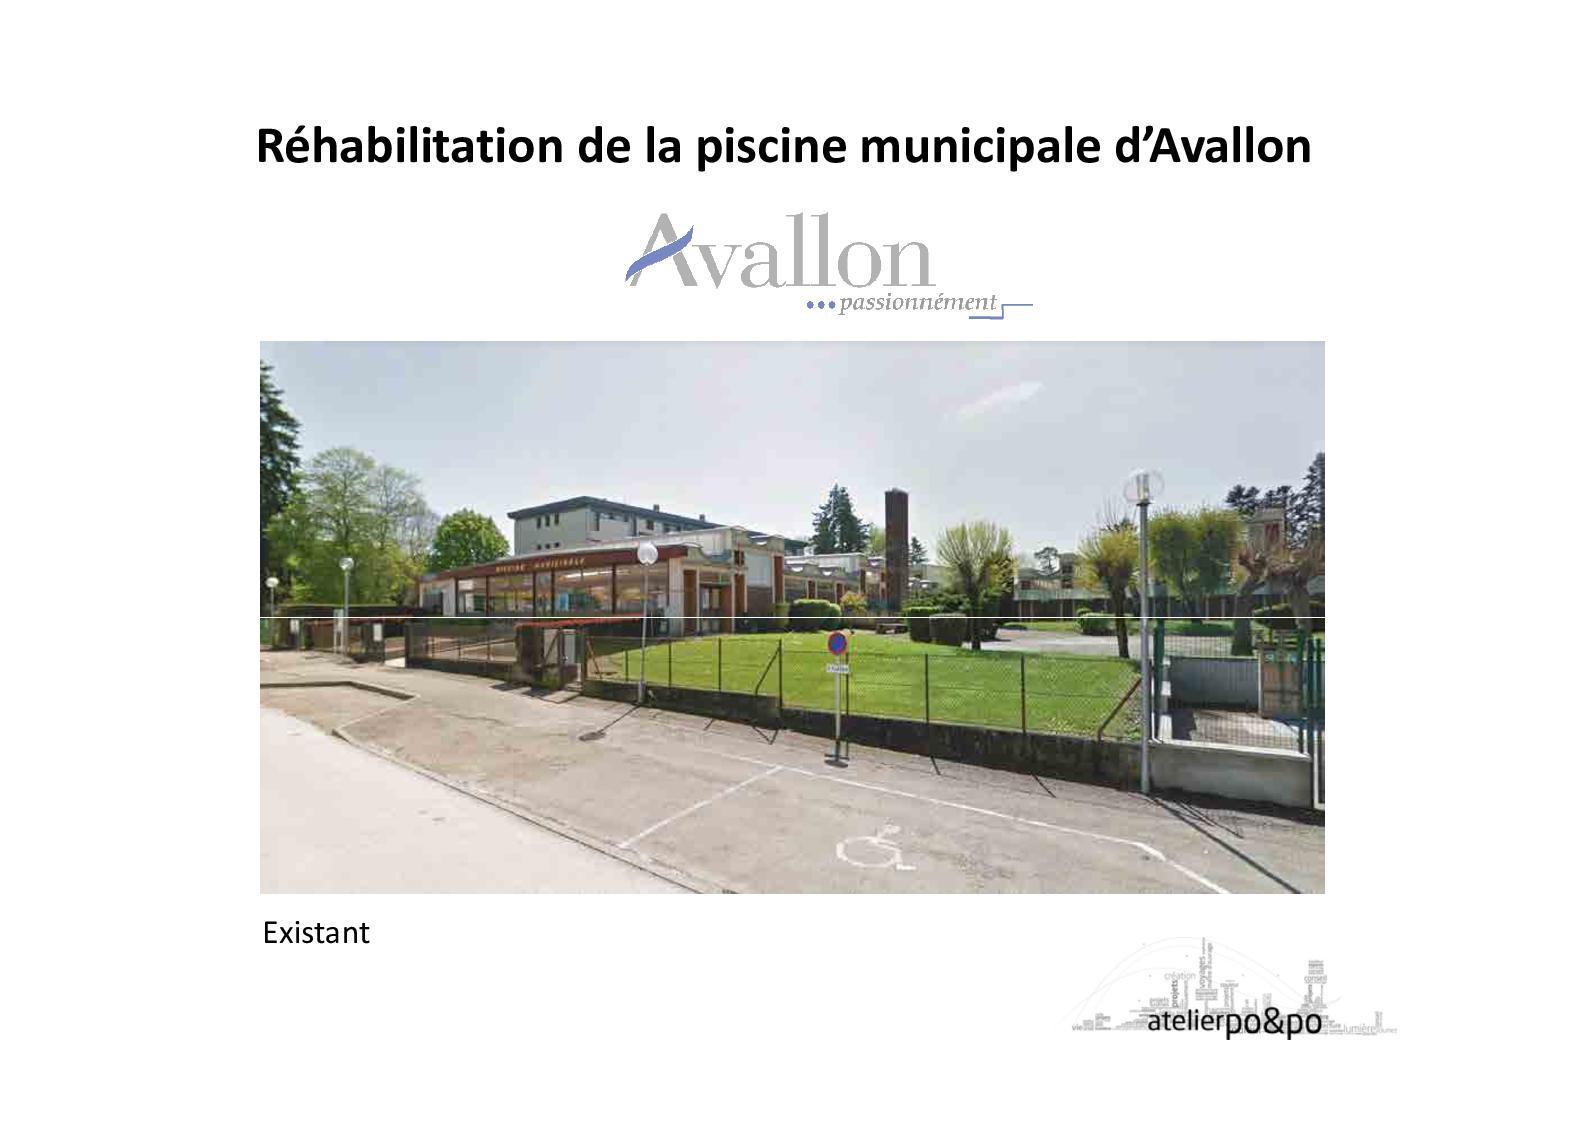 Calaméo - Réhabilitation De La Piscine Municipale D'avallon serapportantà Piscine Avallon